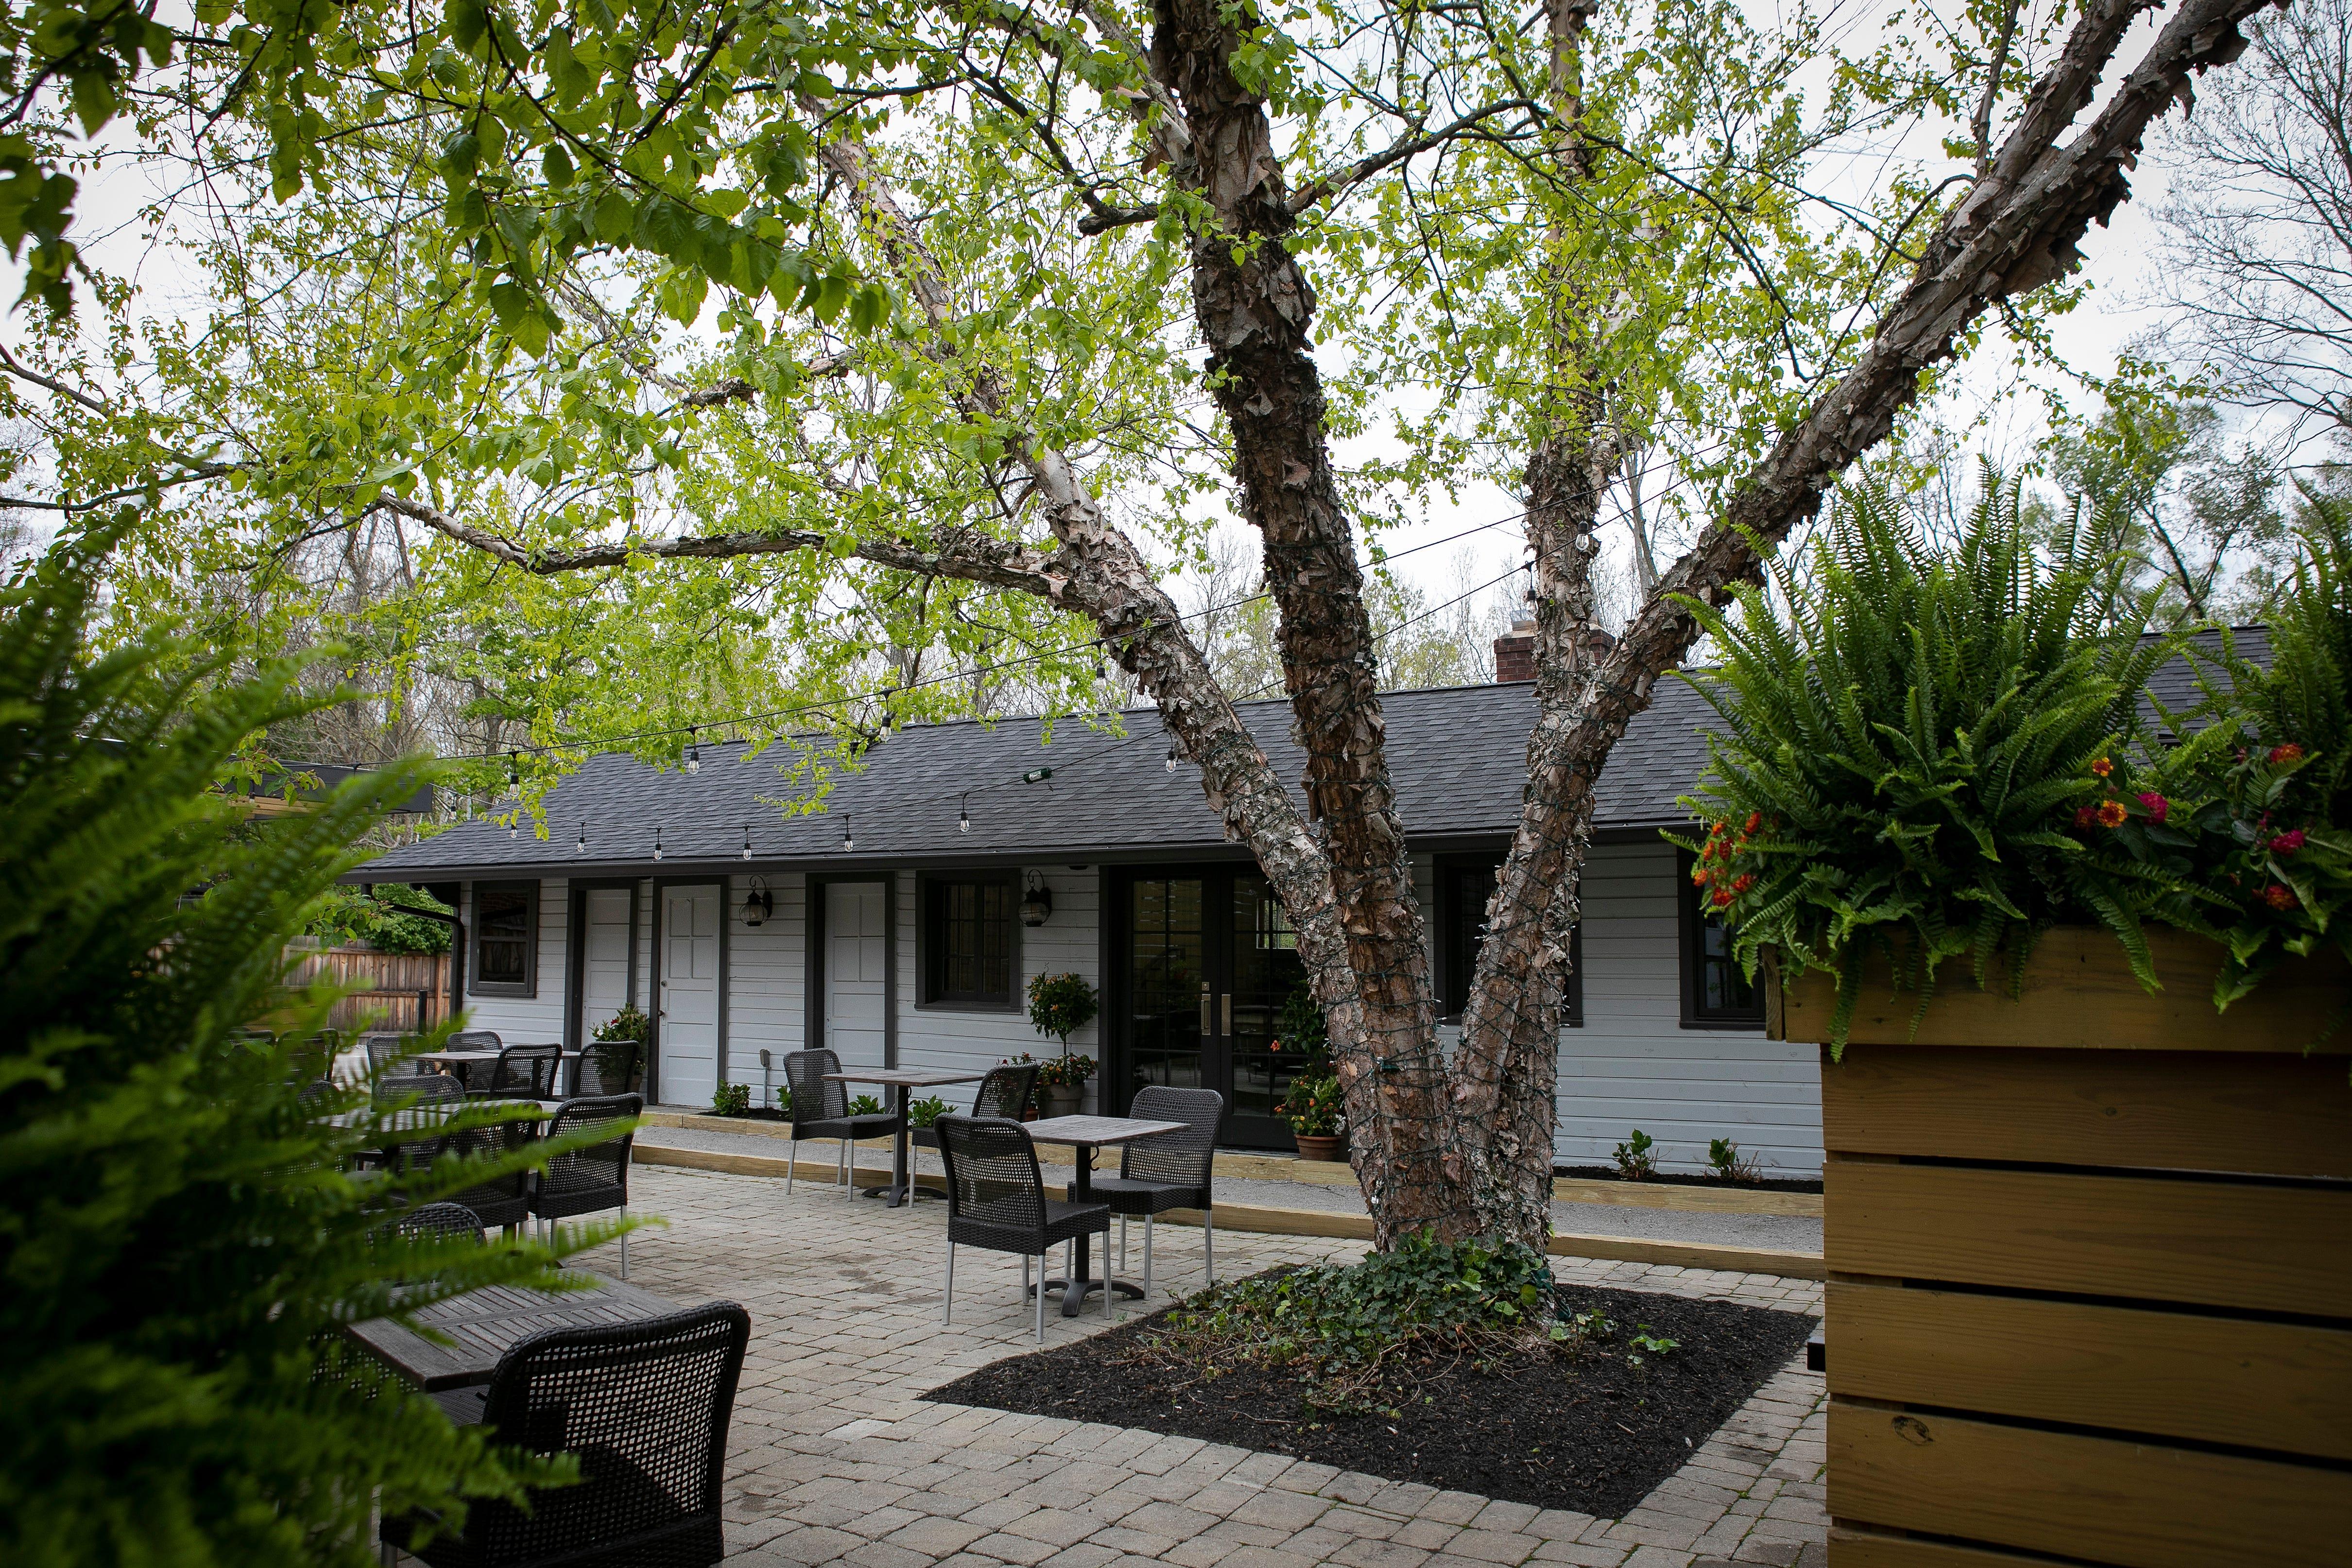 Cincinnati Restaurants Bars Opening May 15 For Outdoor Seating